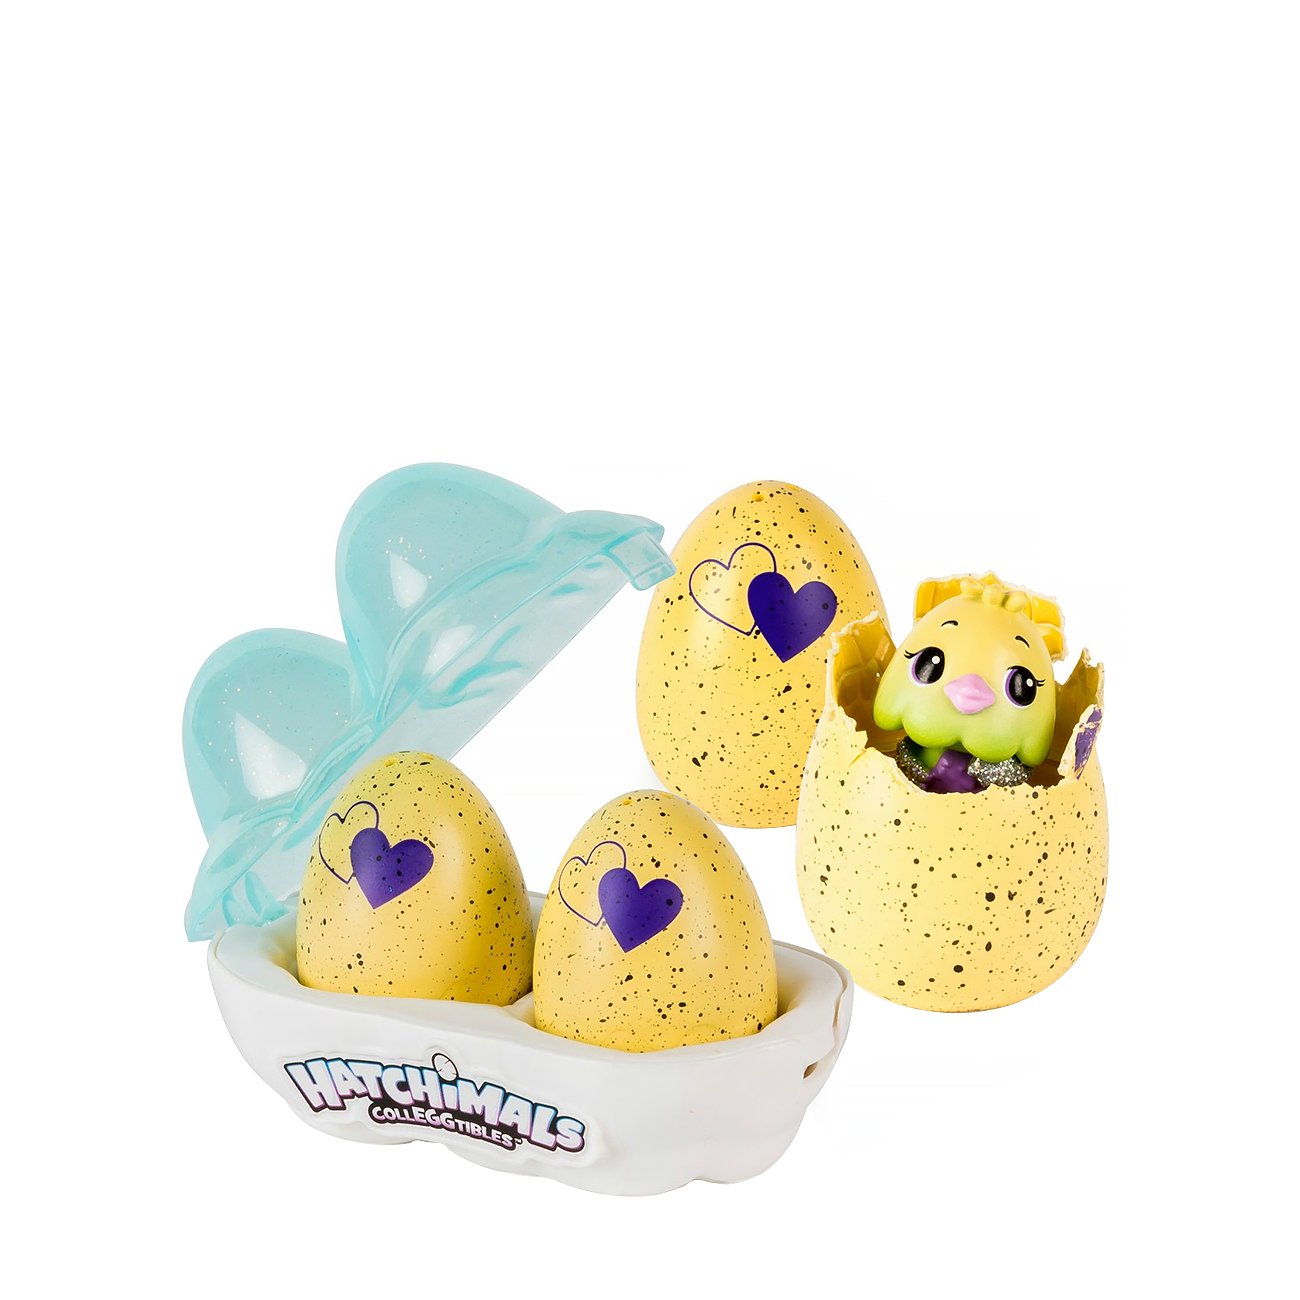 Random Series 3 Colleggtibles 2 Pack Egg Carton